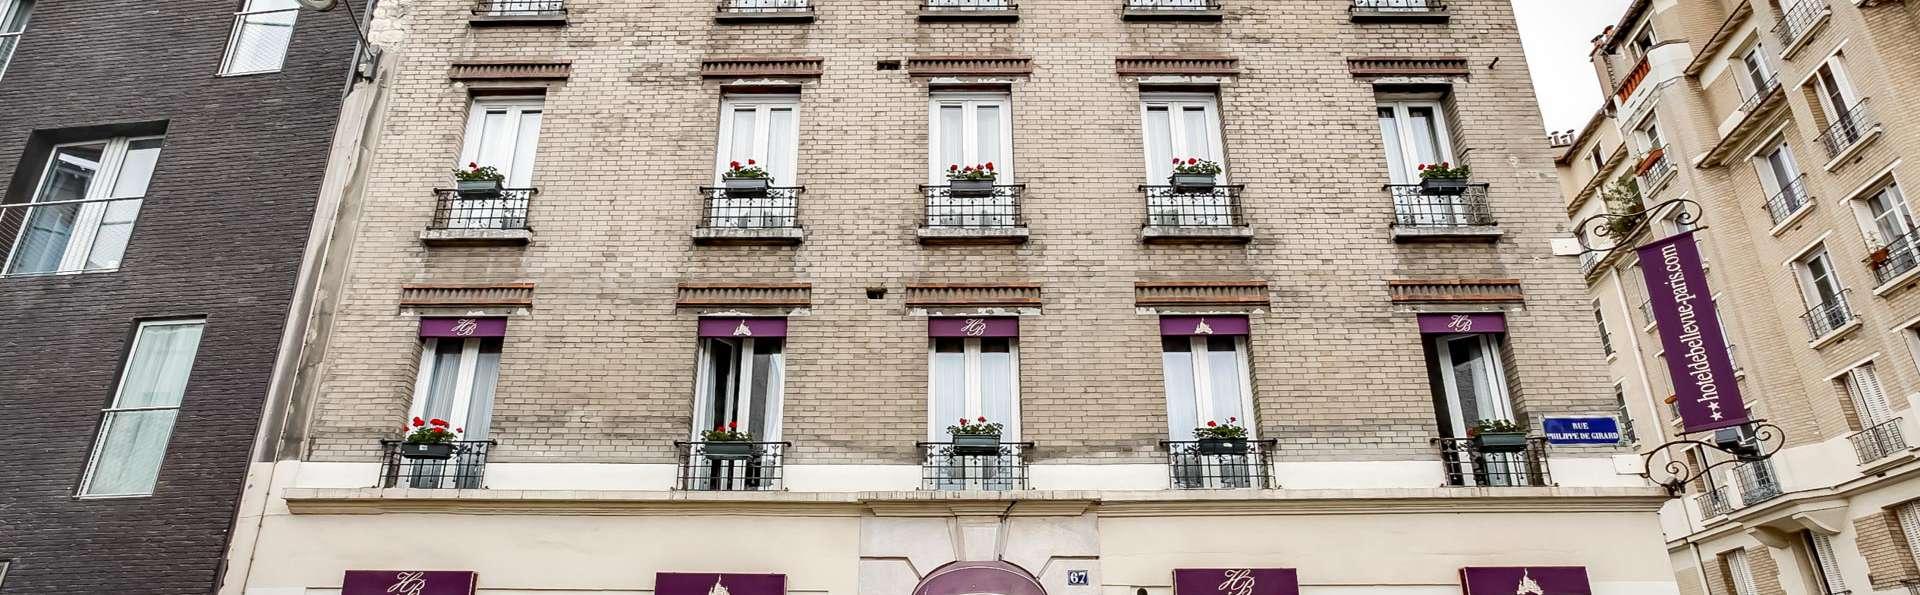 Hotel de Bellevue Paris Gare du Nord - EDIT_FRONT_01.jpg